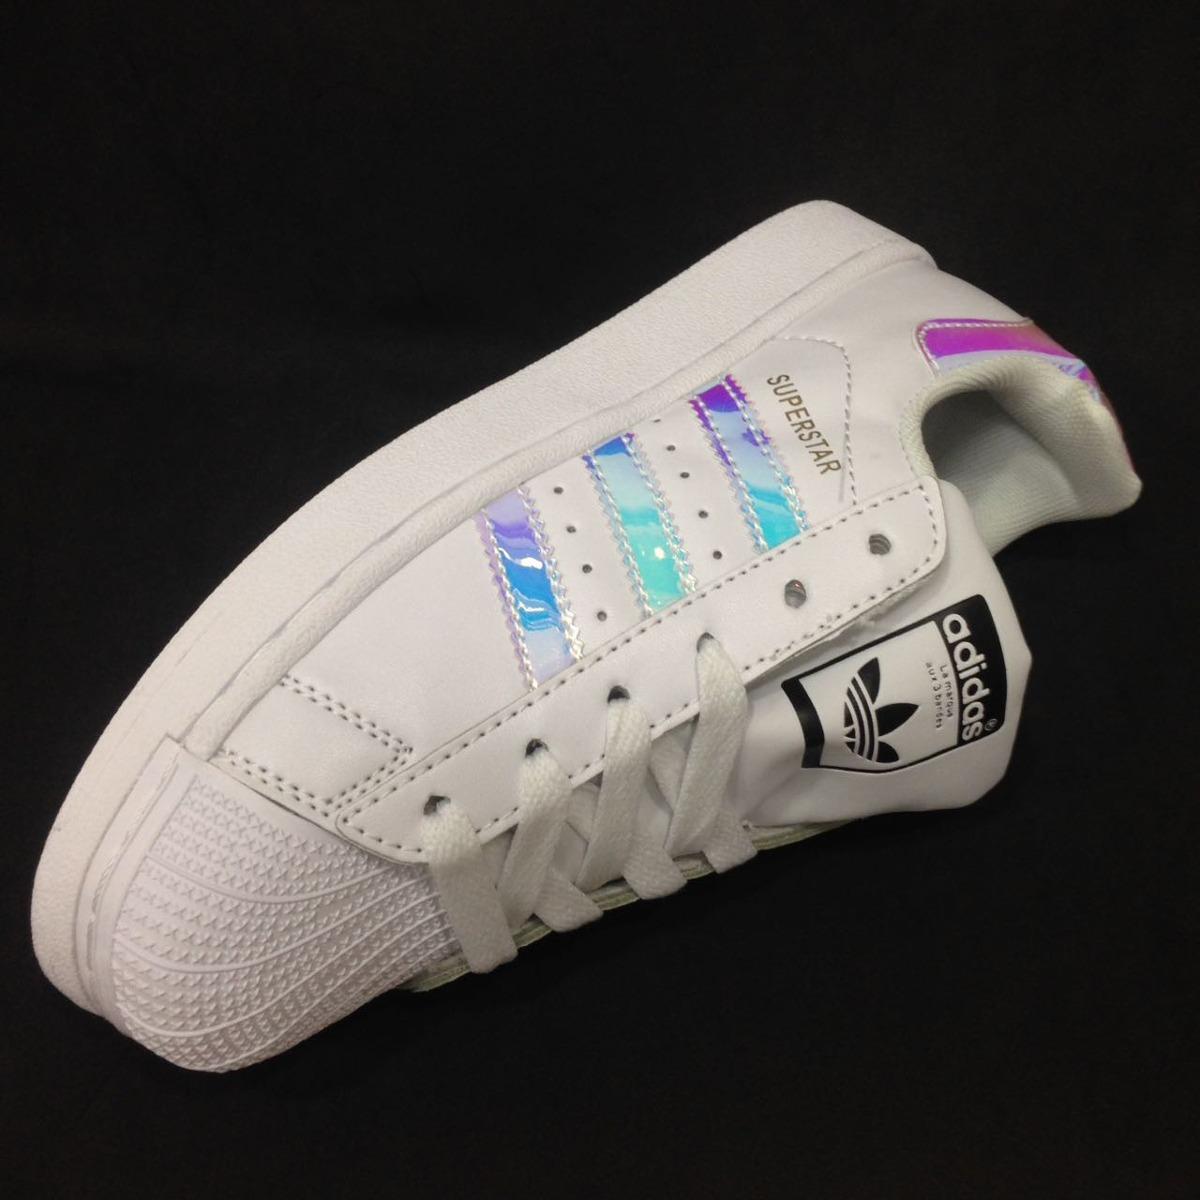 Superstar Dama Diseño Adidas Nuevo Tenis Gratis envio Para Rq511pO